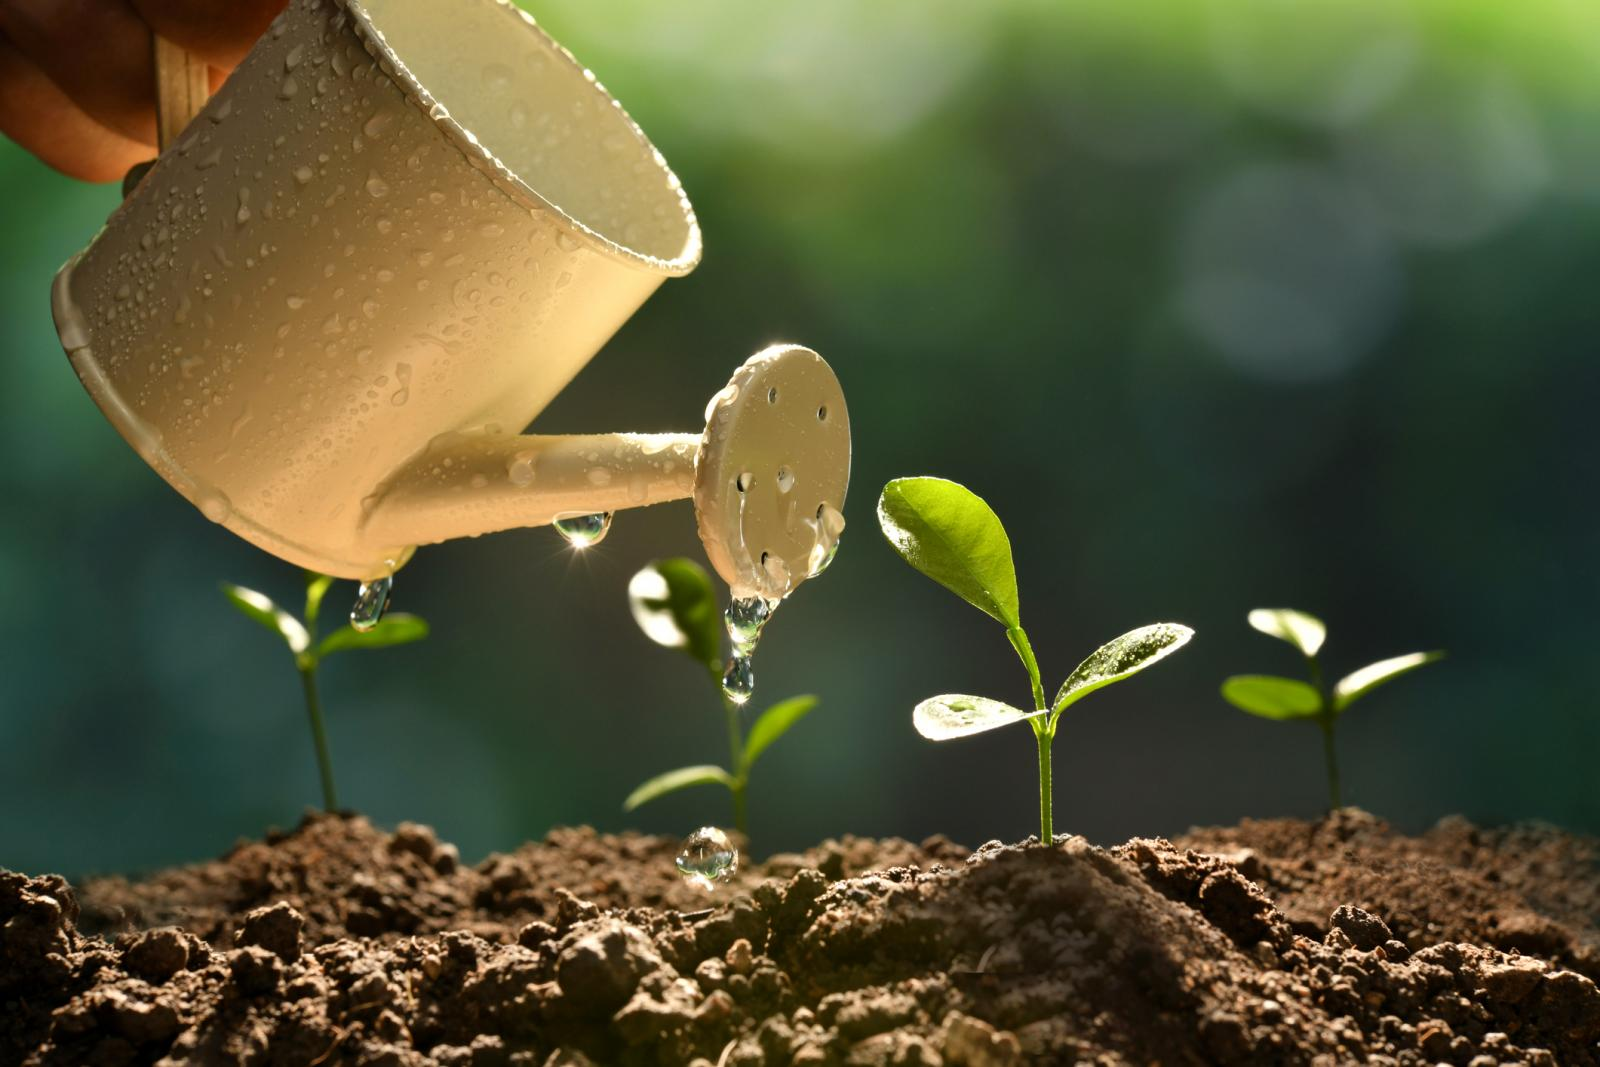 4 Plant Growth Factors That Affect All Plants